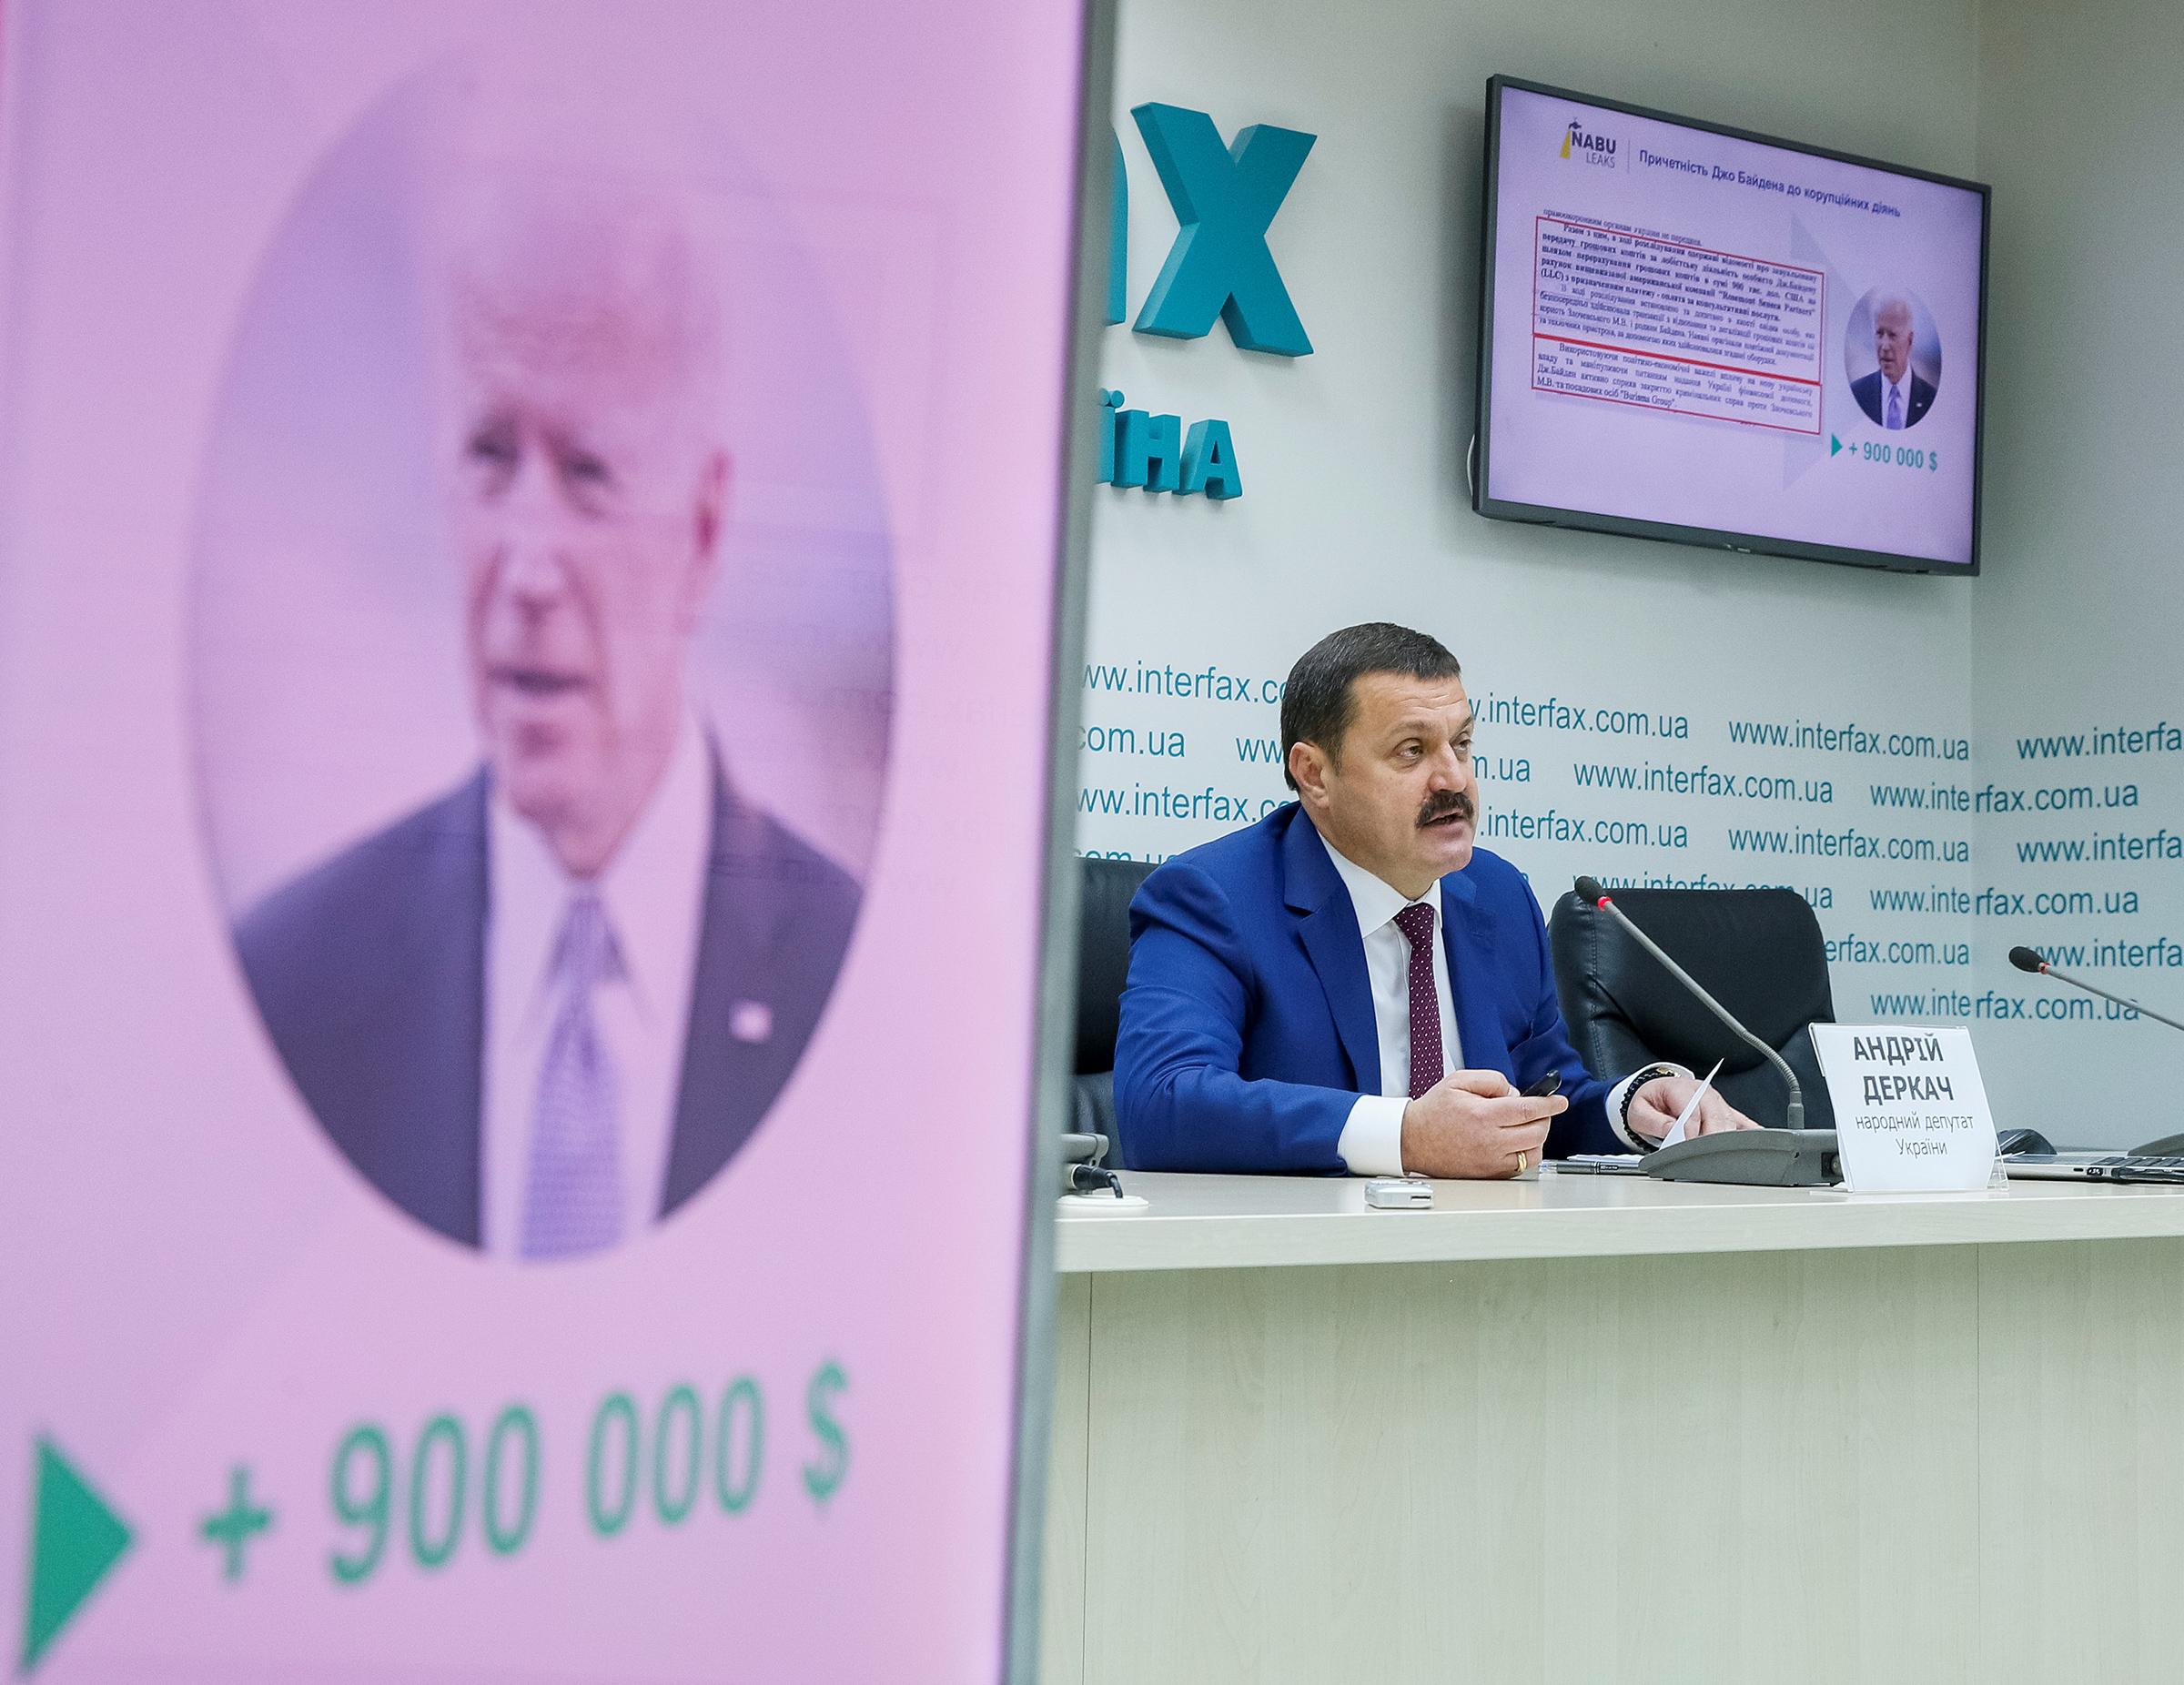 Ukrainian lawmaker Andriy Derkach at a news conference in Kyiv on Oct. 9, 2019.